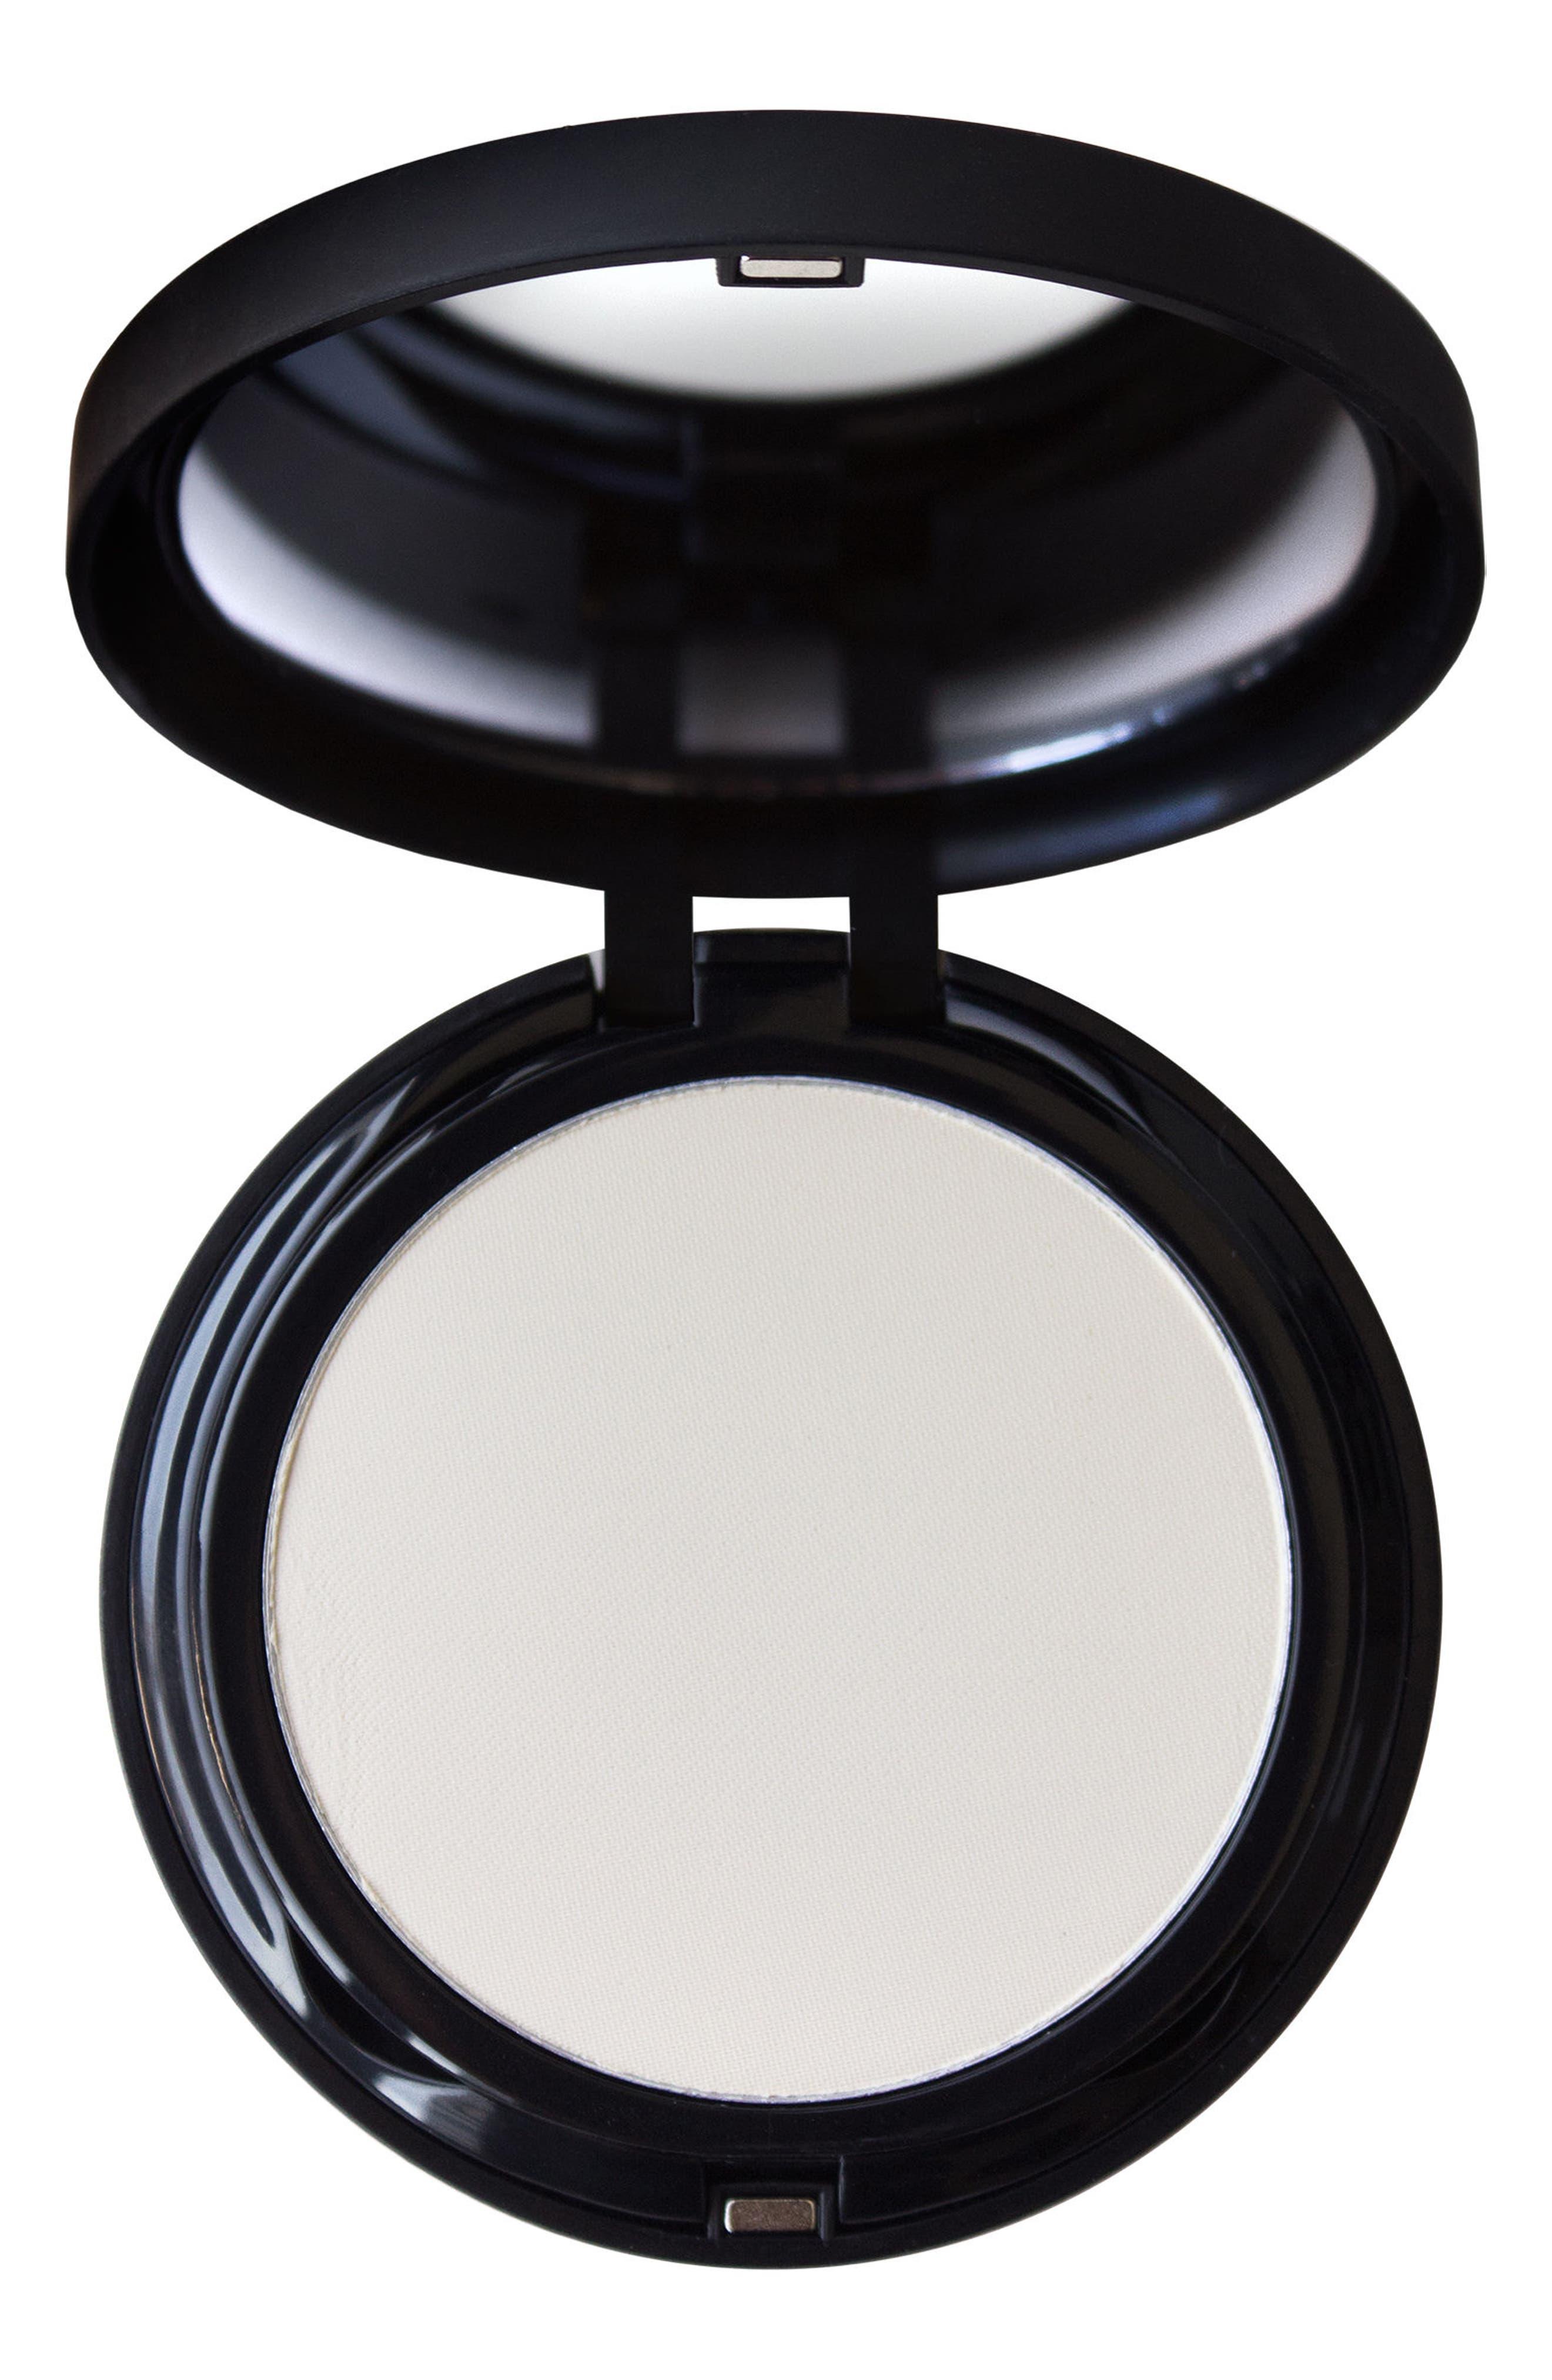 PRO Blurring Translucent Pressed Powder,                         Main,                         color, 000